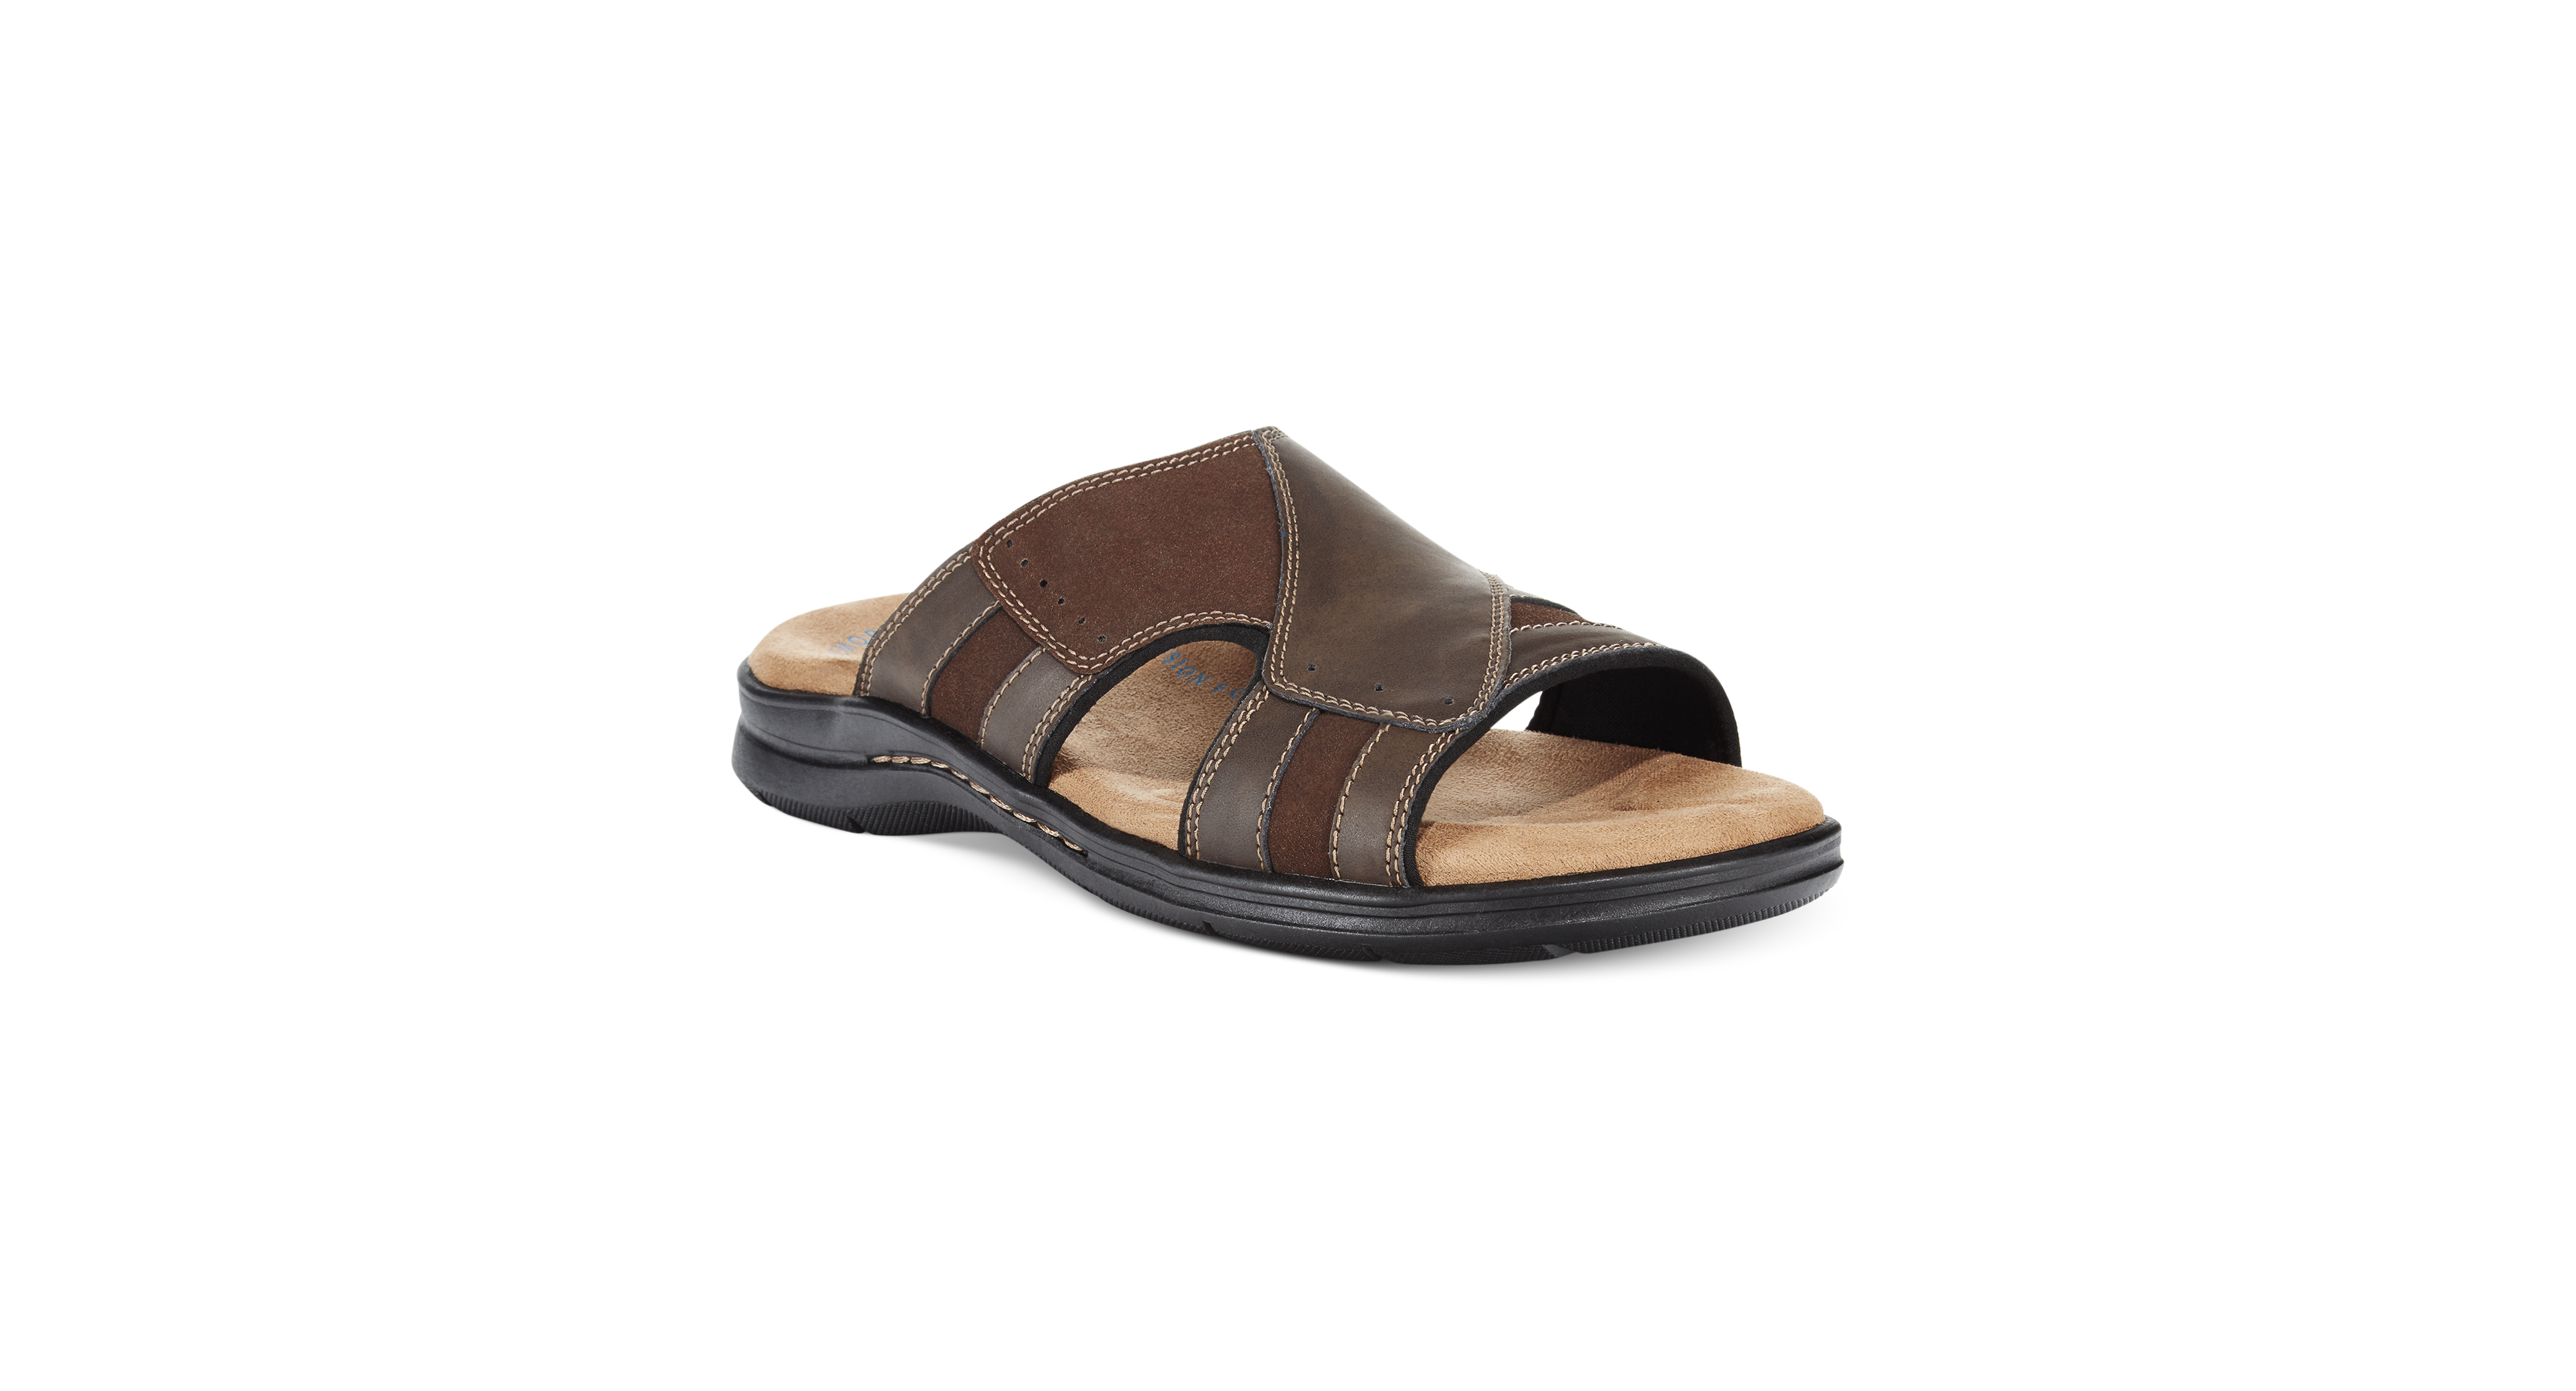 Dockers Seaton Slide Sandals